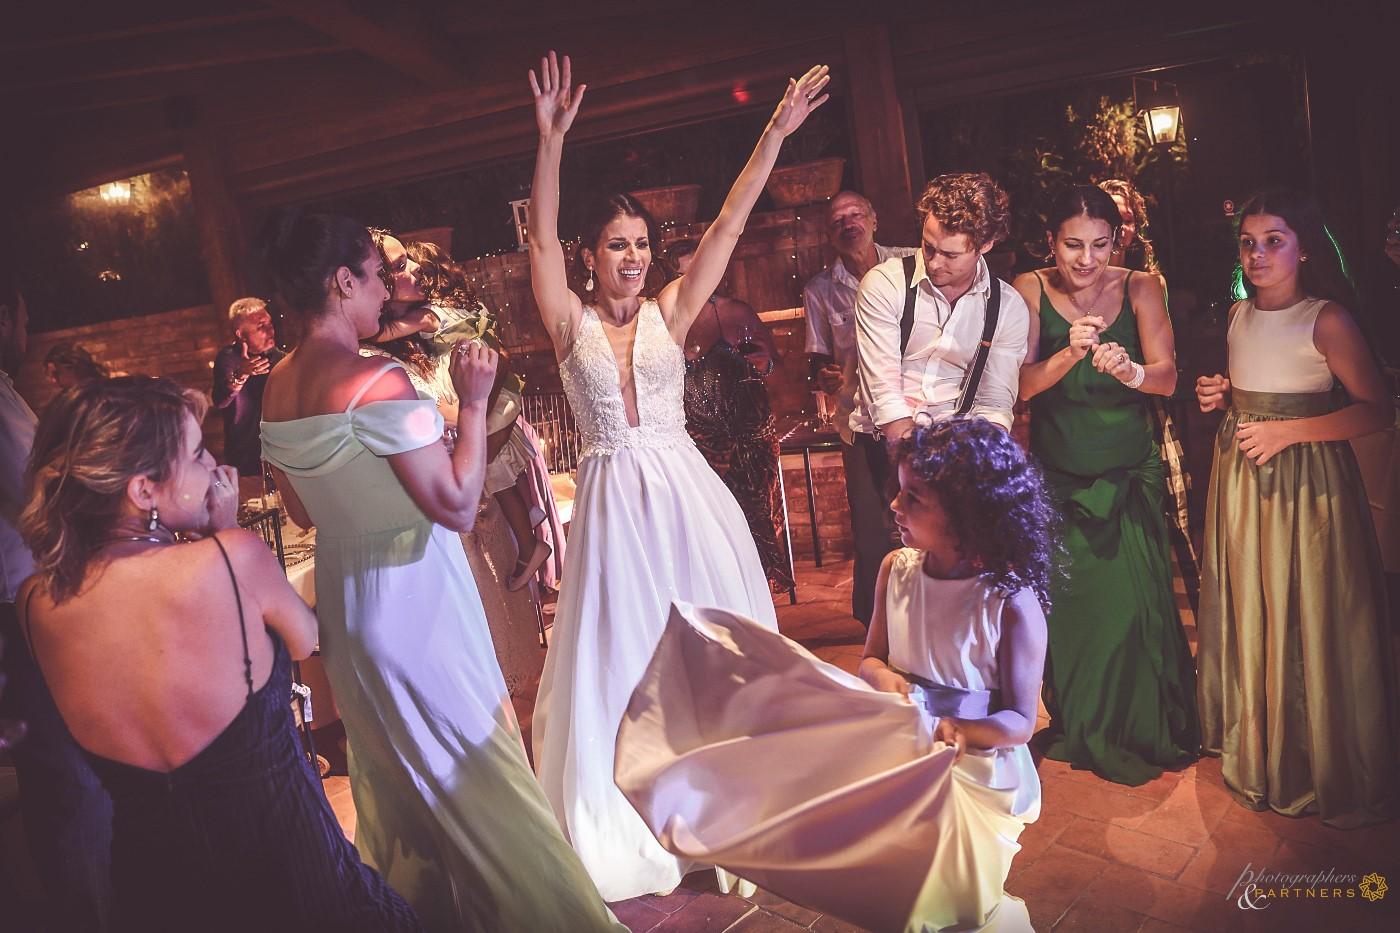 photographer_weddings_montepulciano_21.jpg